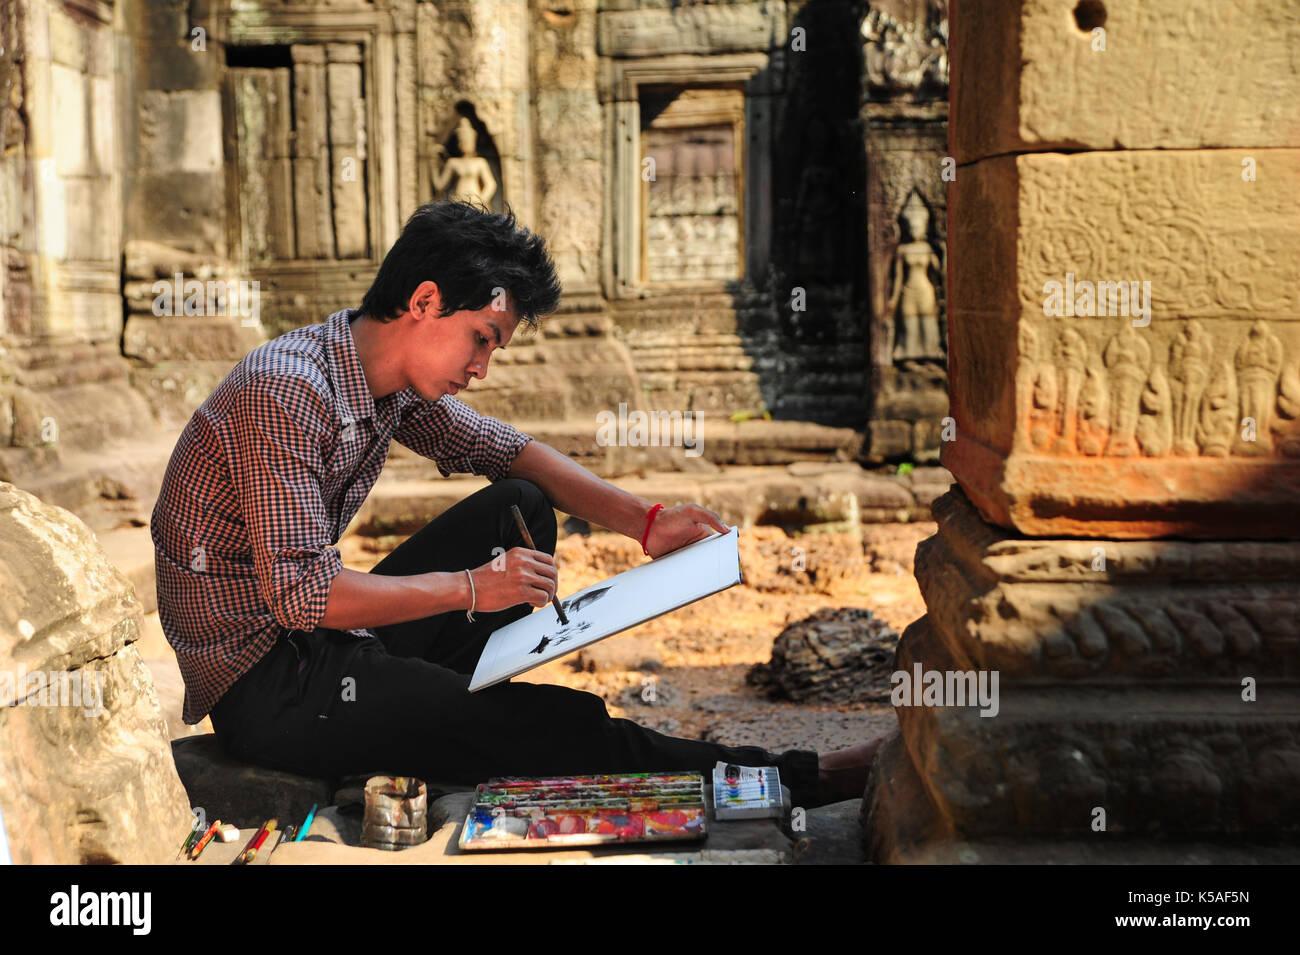 Siem Reap,Cambodia - Feb 10,2013:Artist painting in ruins of Angkor Wat,Siem Reap,Cambodia. - Stock Image